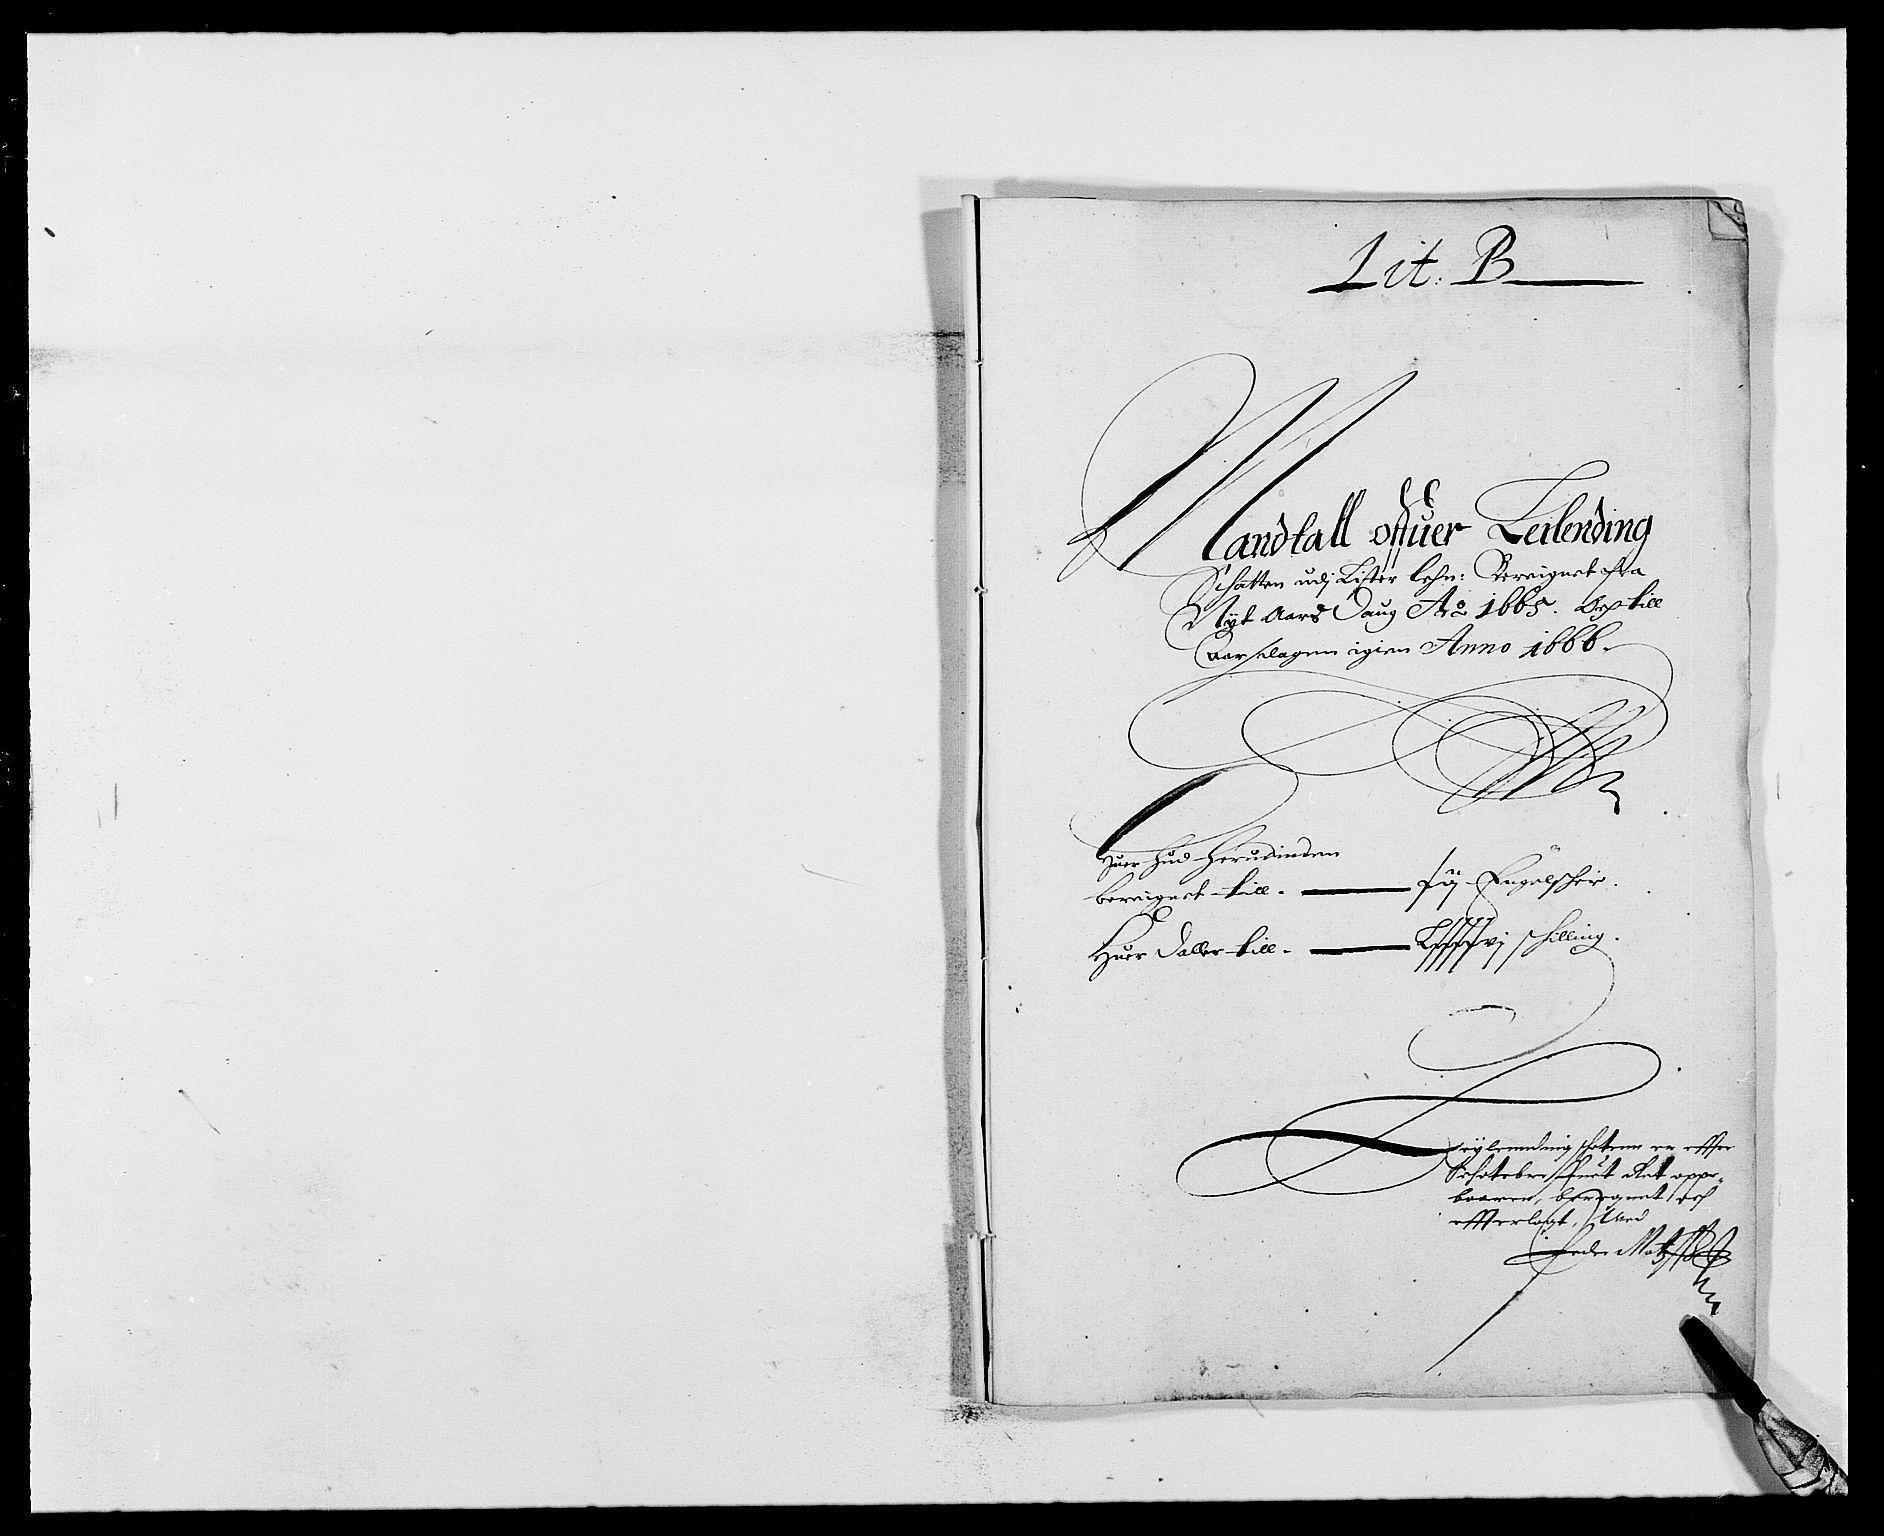 RA, Rentekammeret inntil 1814, Reviderte regnskaper, Fogderegnskap, R41/L2524: Fogderegnskap Lista, 1665-1668, s. 18